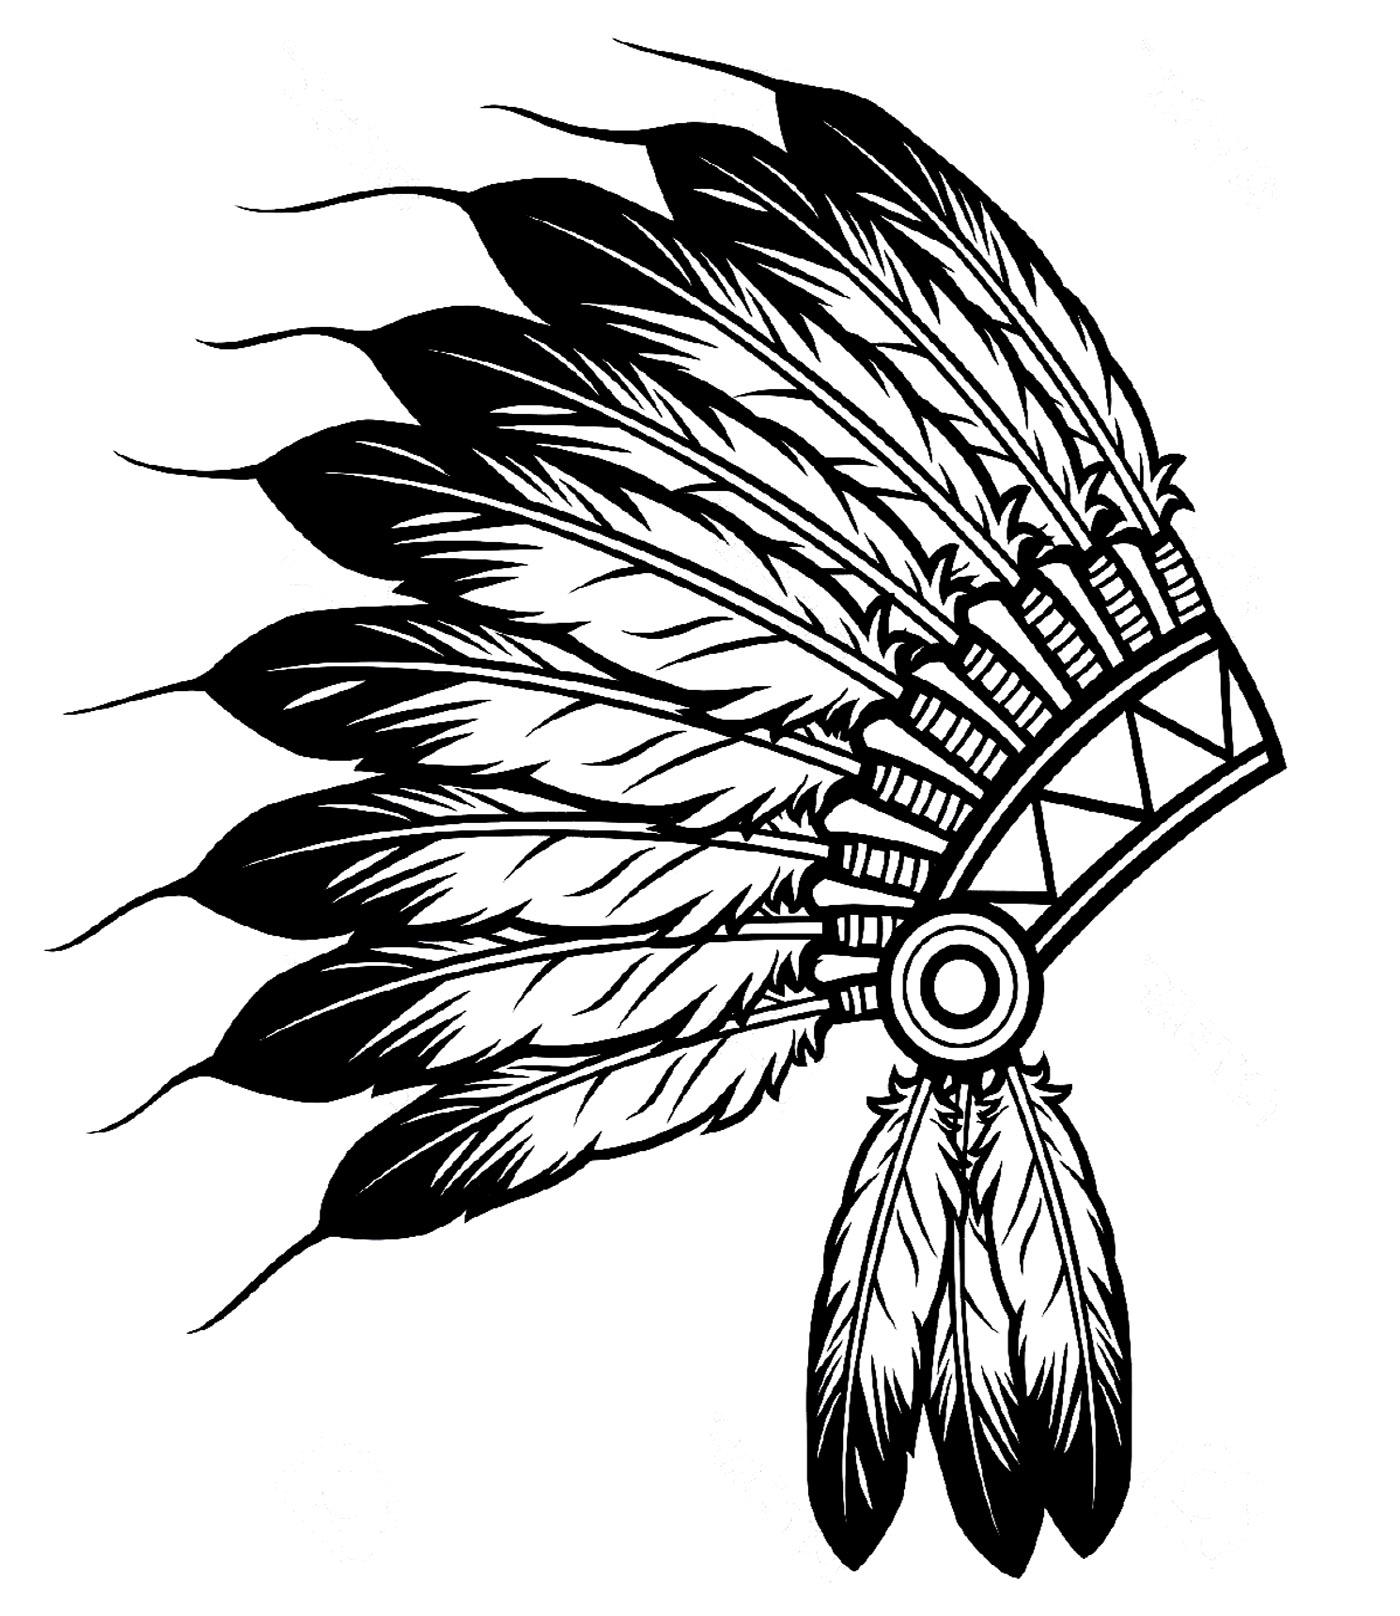 American indian headdress clipart jpg library download Free Indian Headdress Clipart Black And White, Download Free Clip ... jpg library download